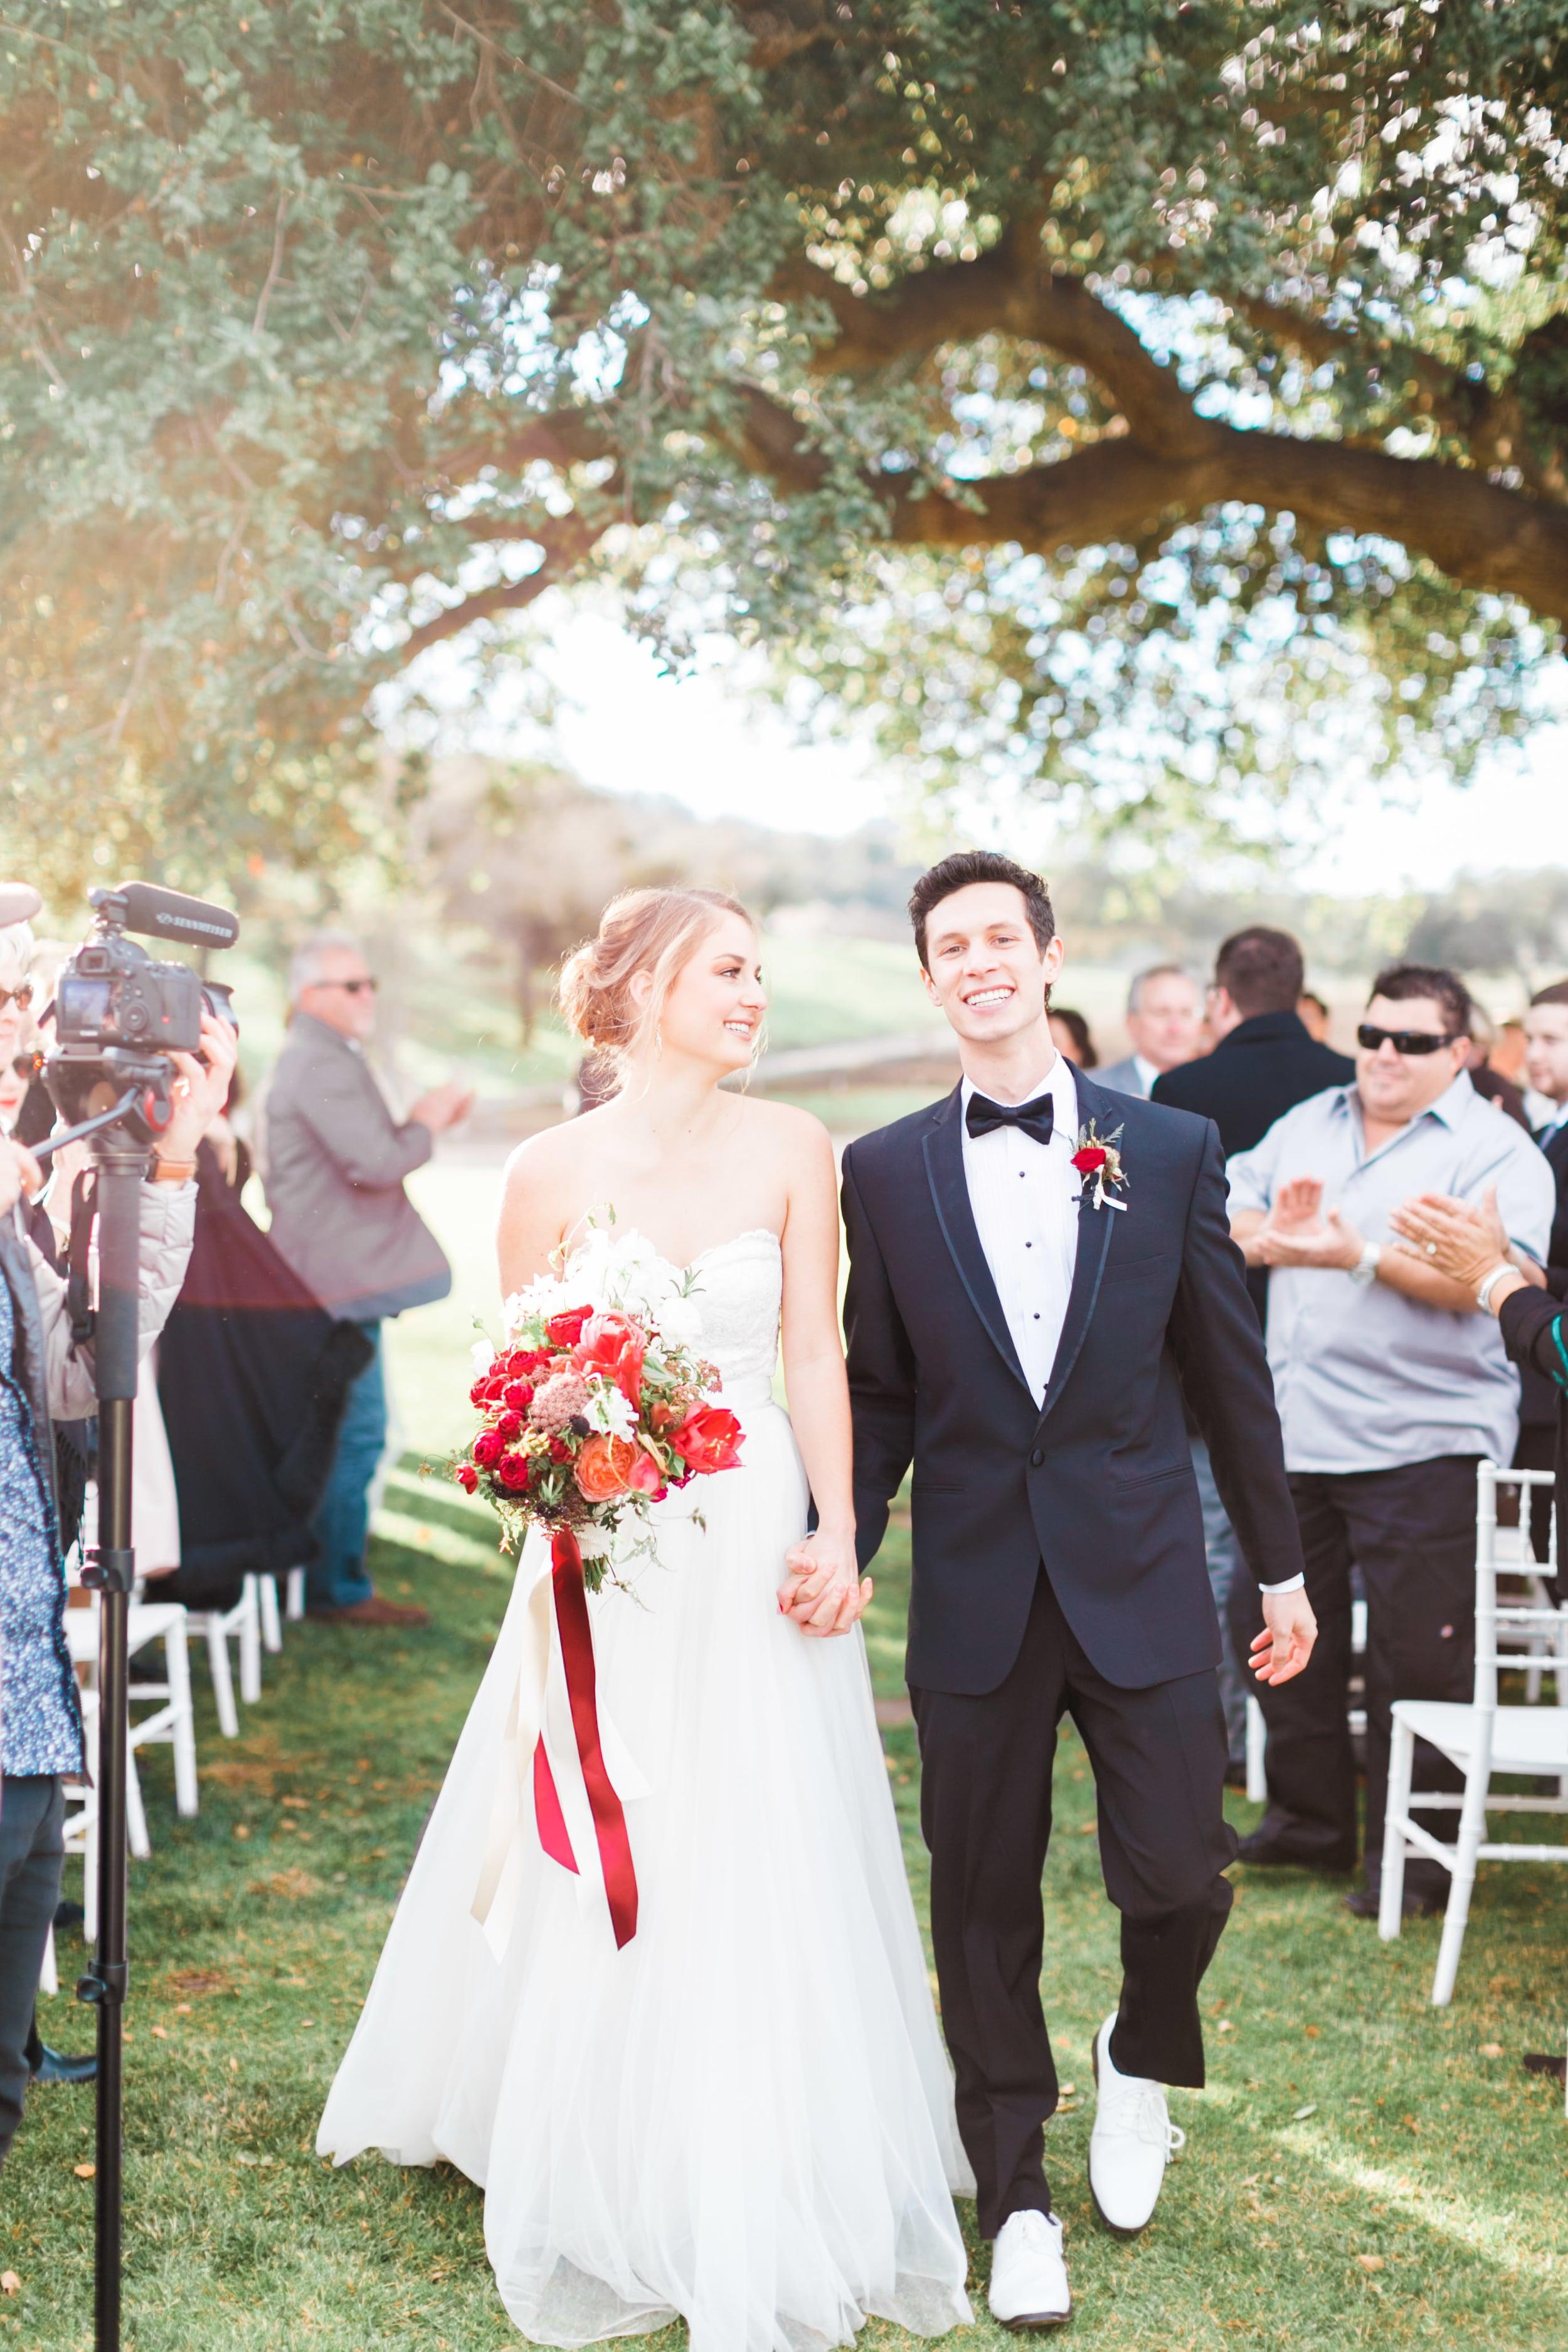 Natalie_Schutt_Photography_Winter_Wedding_San_Luis_Obispo-147.jpg